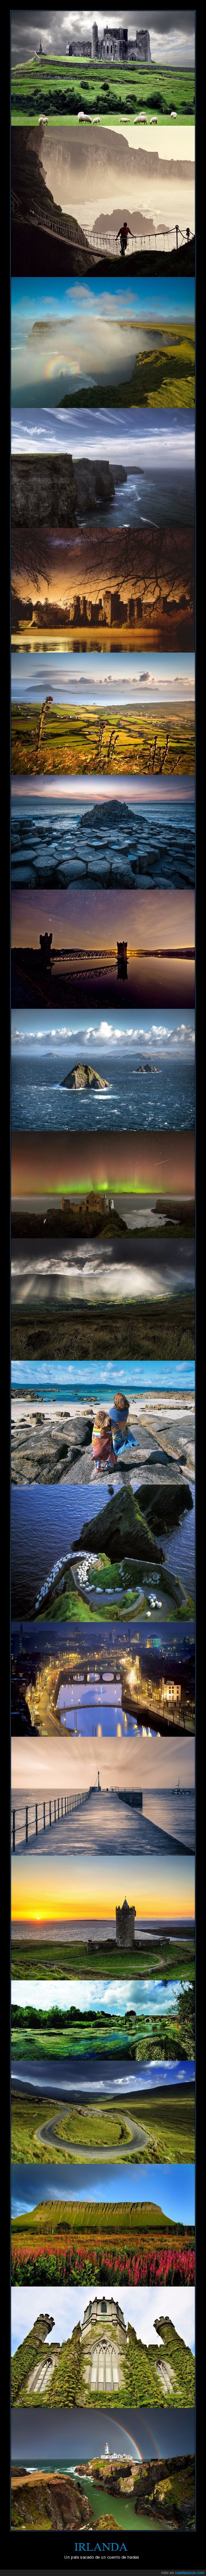 geografía,irlanda,país